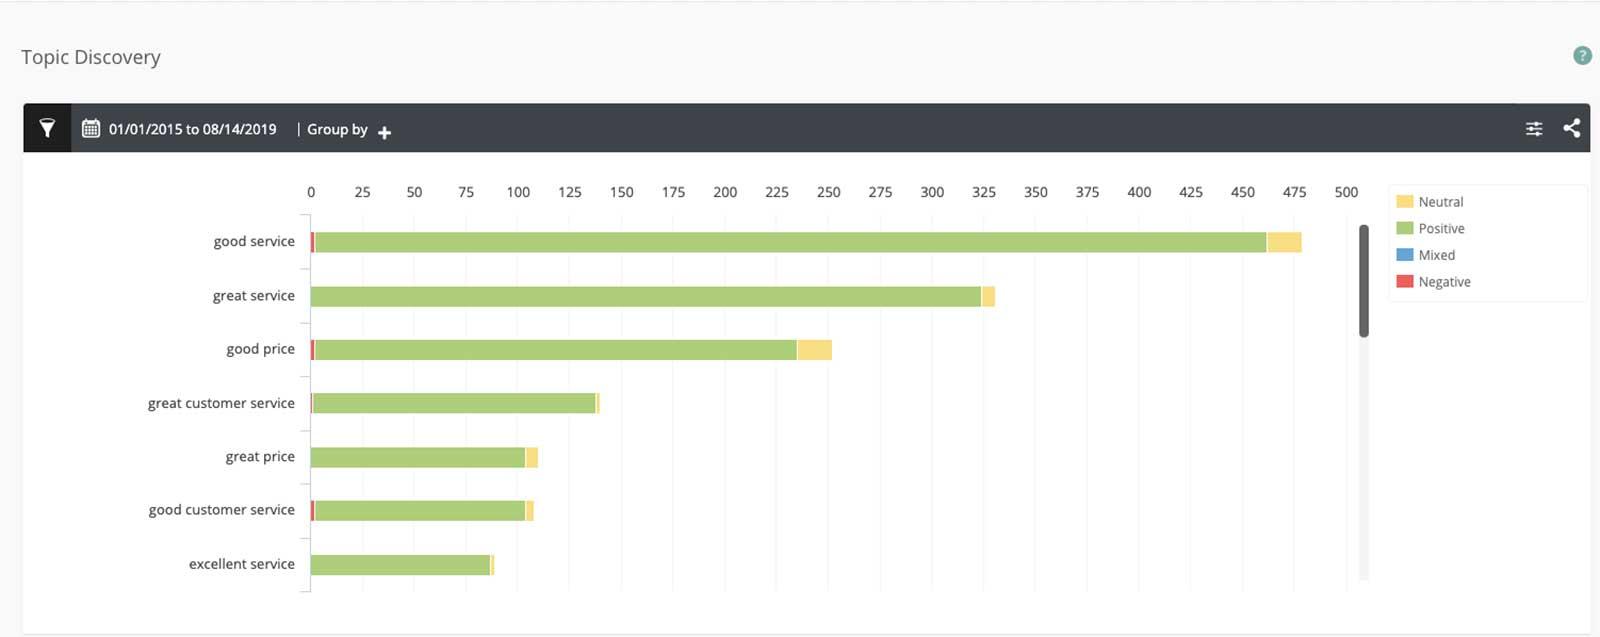 Customer Experience -Satmetrix Topic Discovery Screenshot